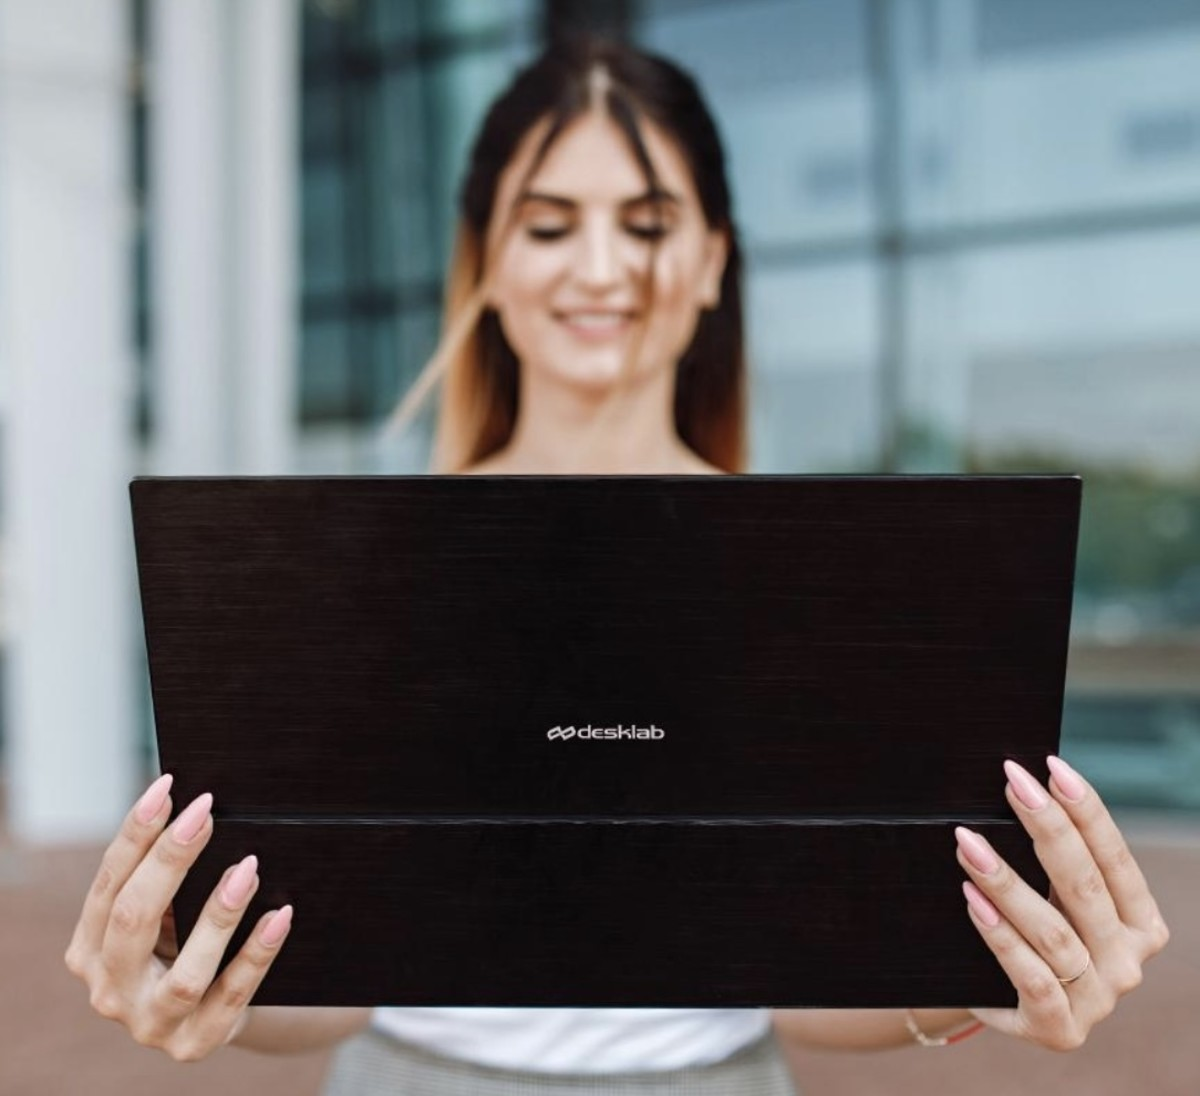 desklabs-portable-4k-touchscreen-monitor-really-does-the-job